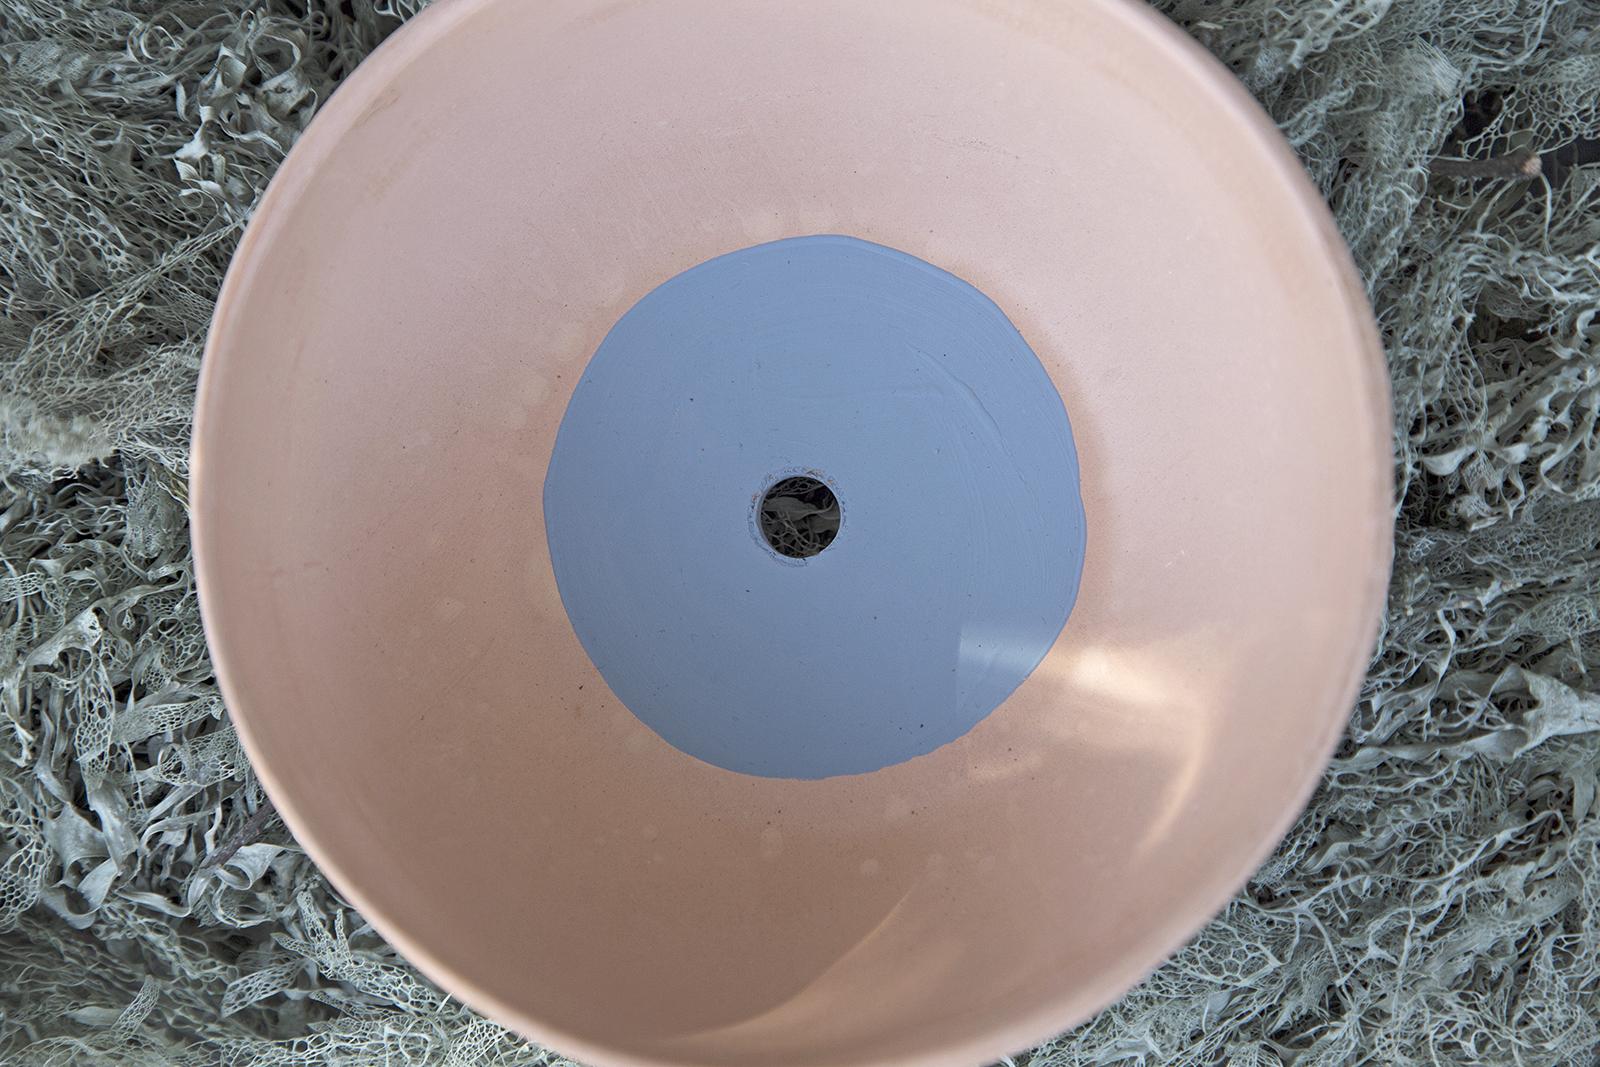 cody_hudson_public_land_planters_low_bowl_inside.jpg